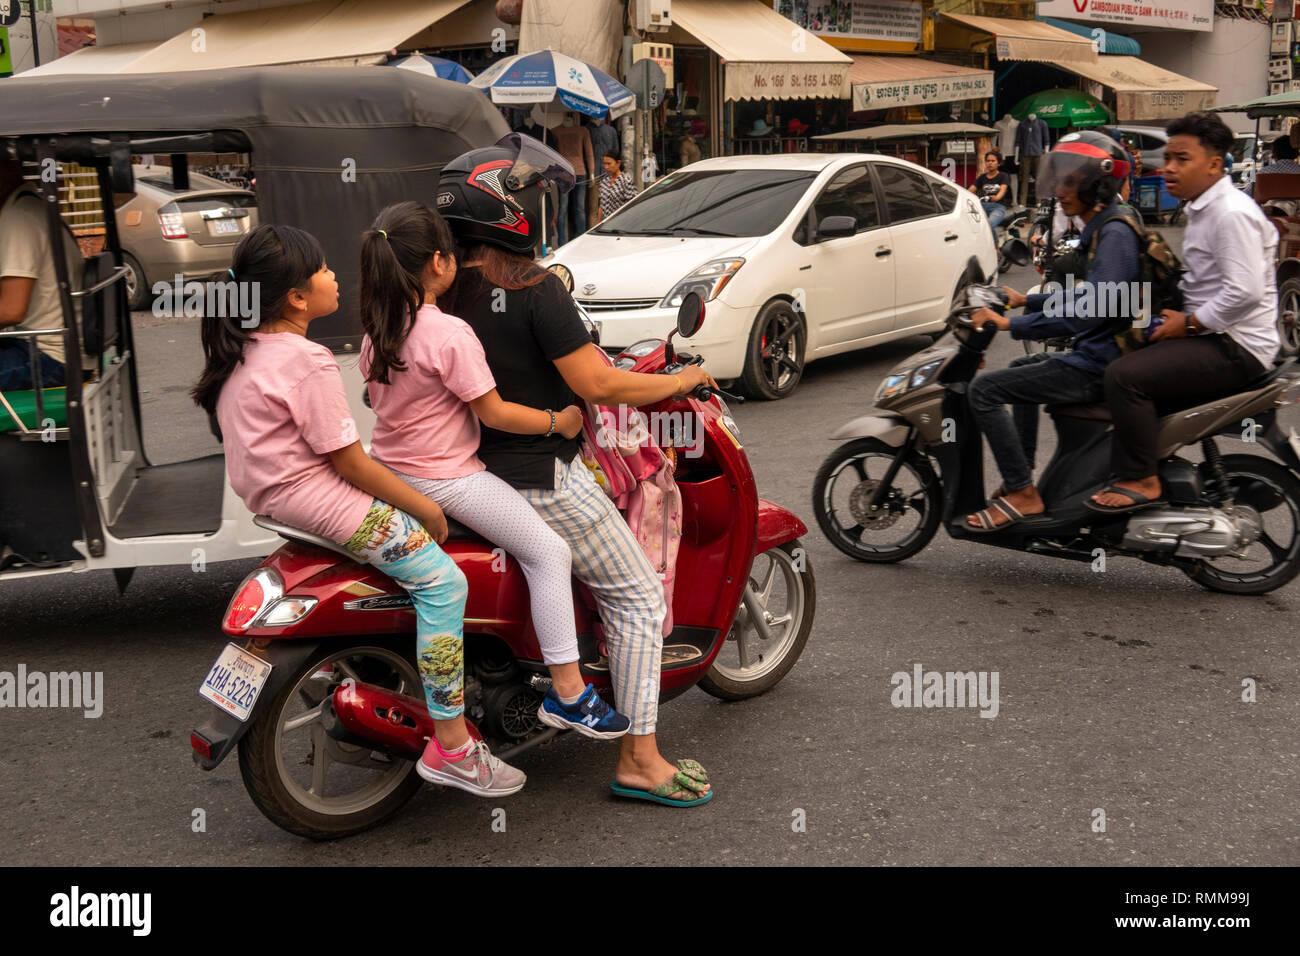 Cambodia, Phnom Penh, Chamkar Mon District, Russian Market, Phsar, Tuol Tom Poung, traffic chaos, at road junction, three people on motorbike - Stock Image